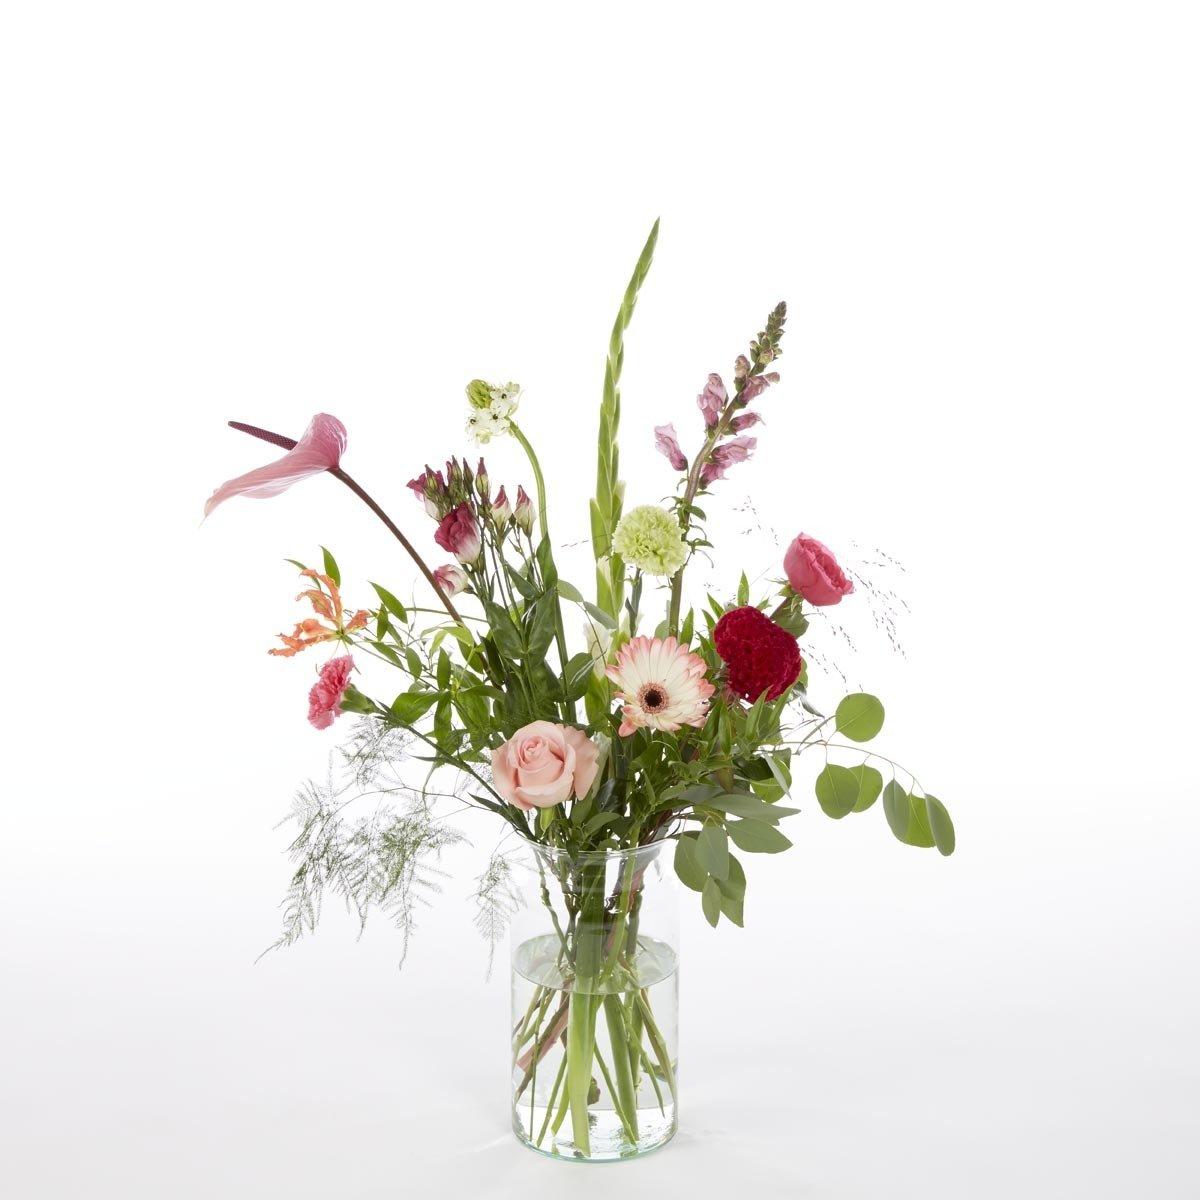 Veens bloemetje Anne (Medium)